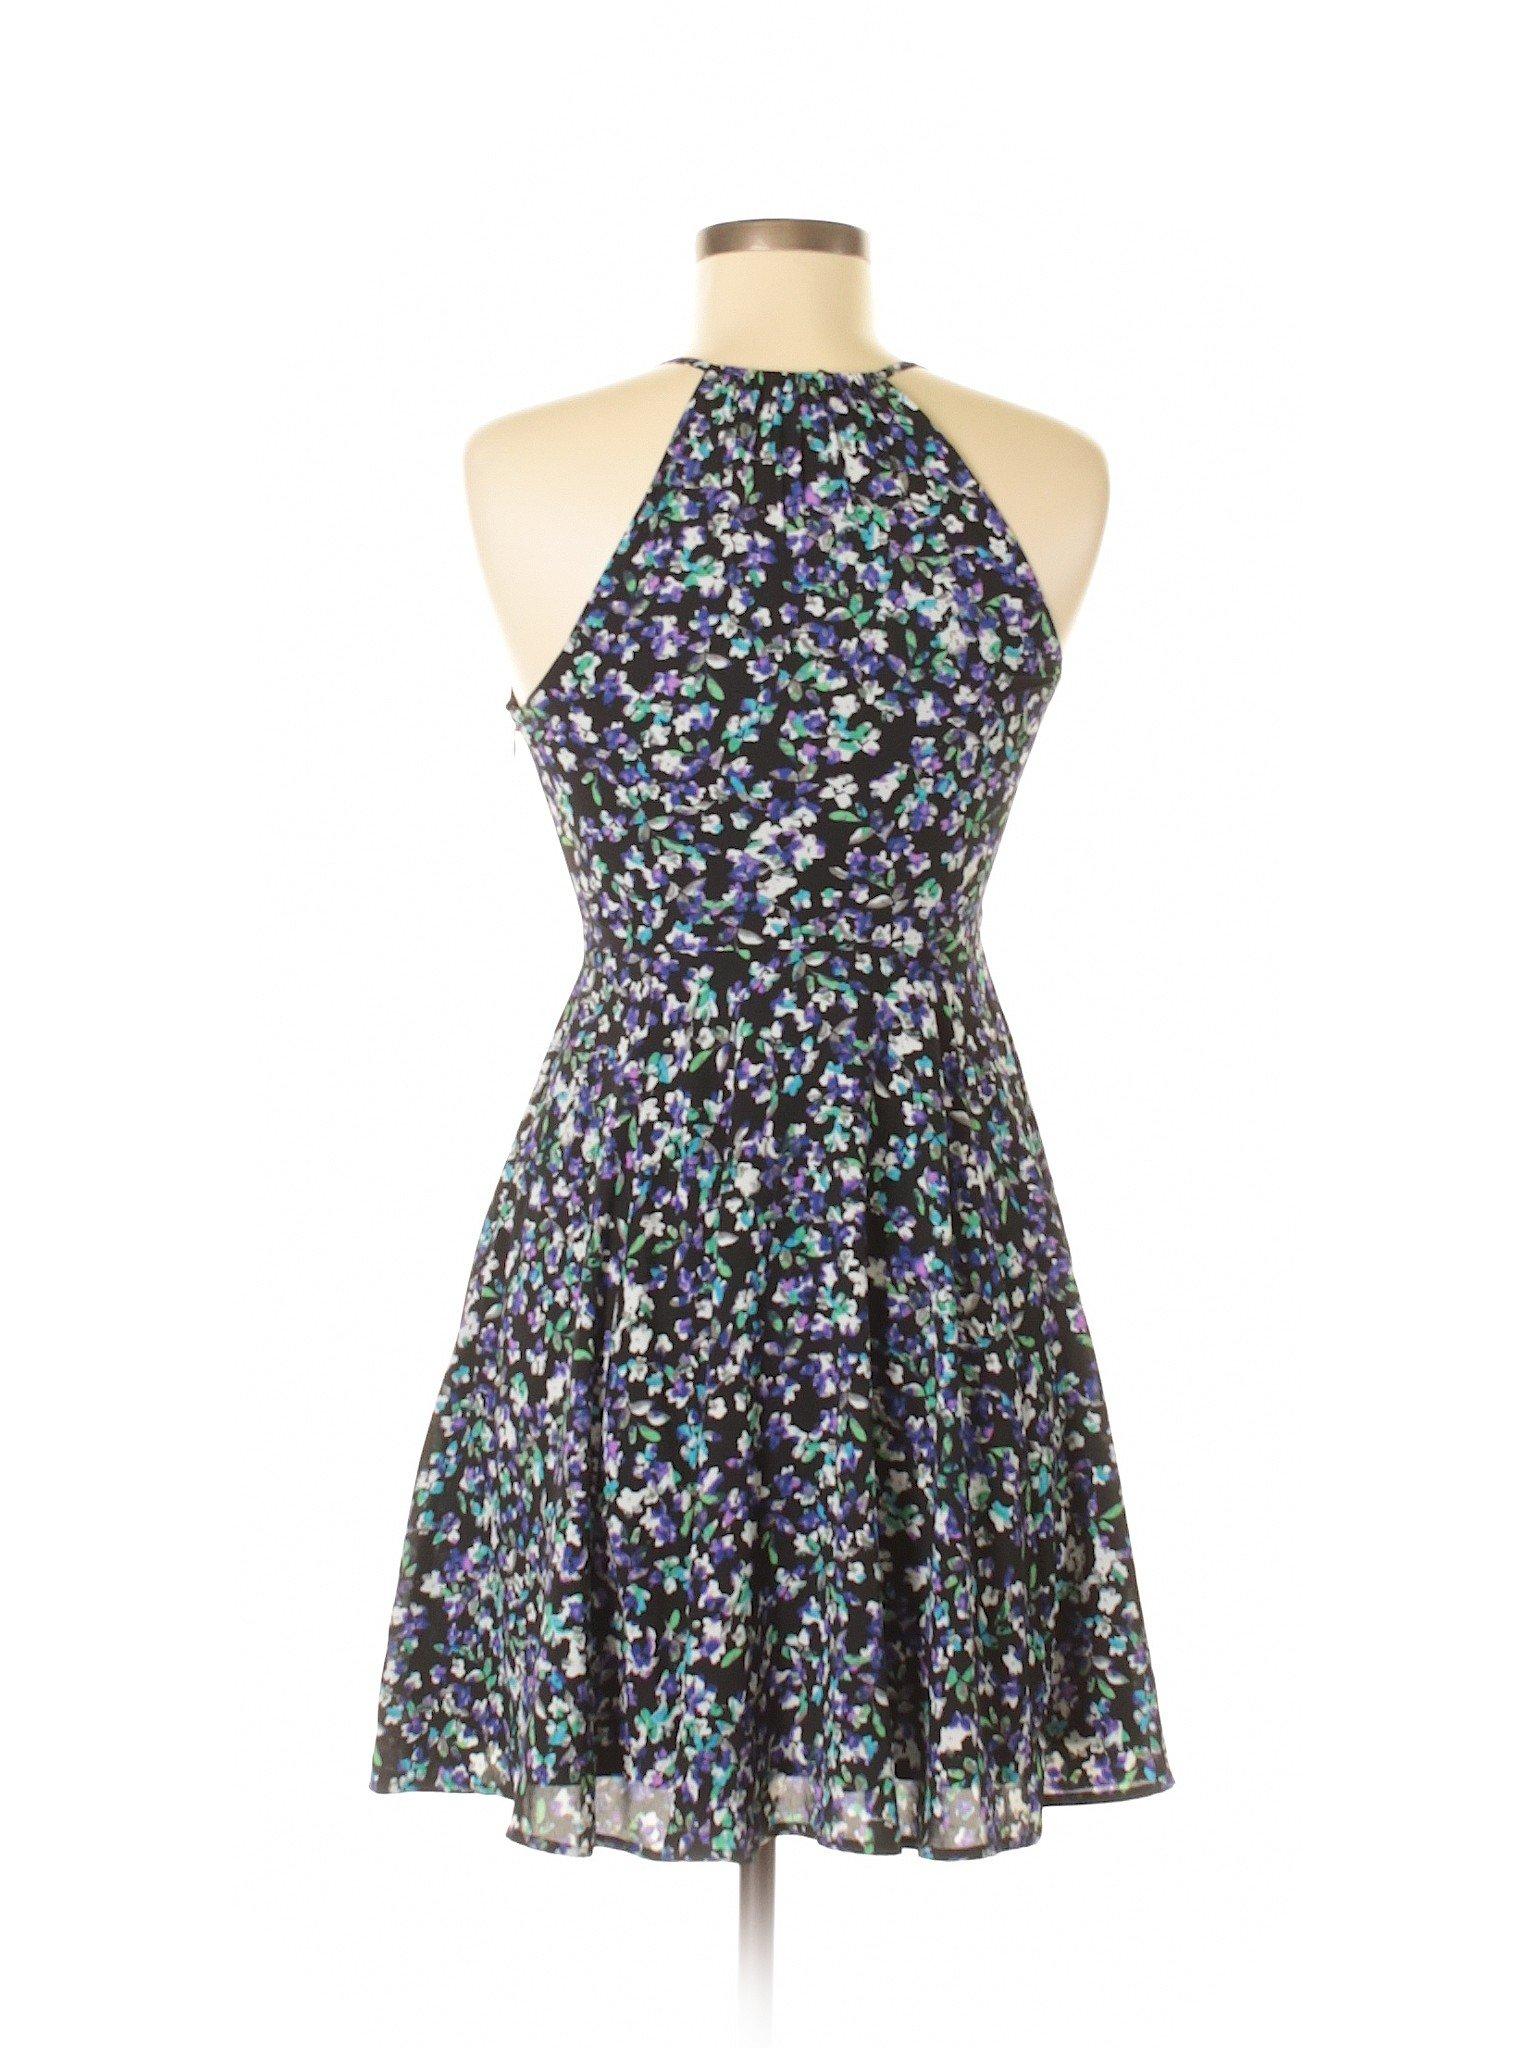 Dress Boutique Express winter Express Casual Casual winter Boutique qt0wBEf